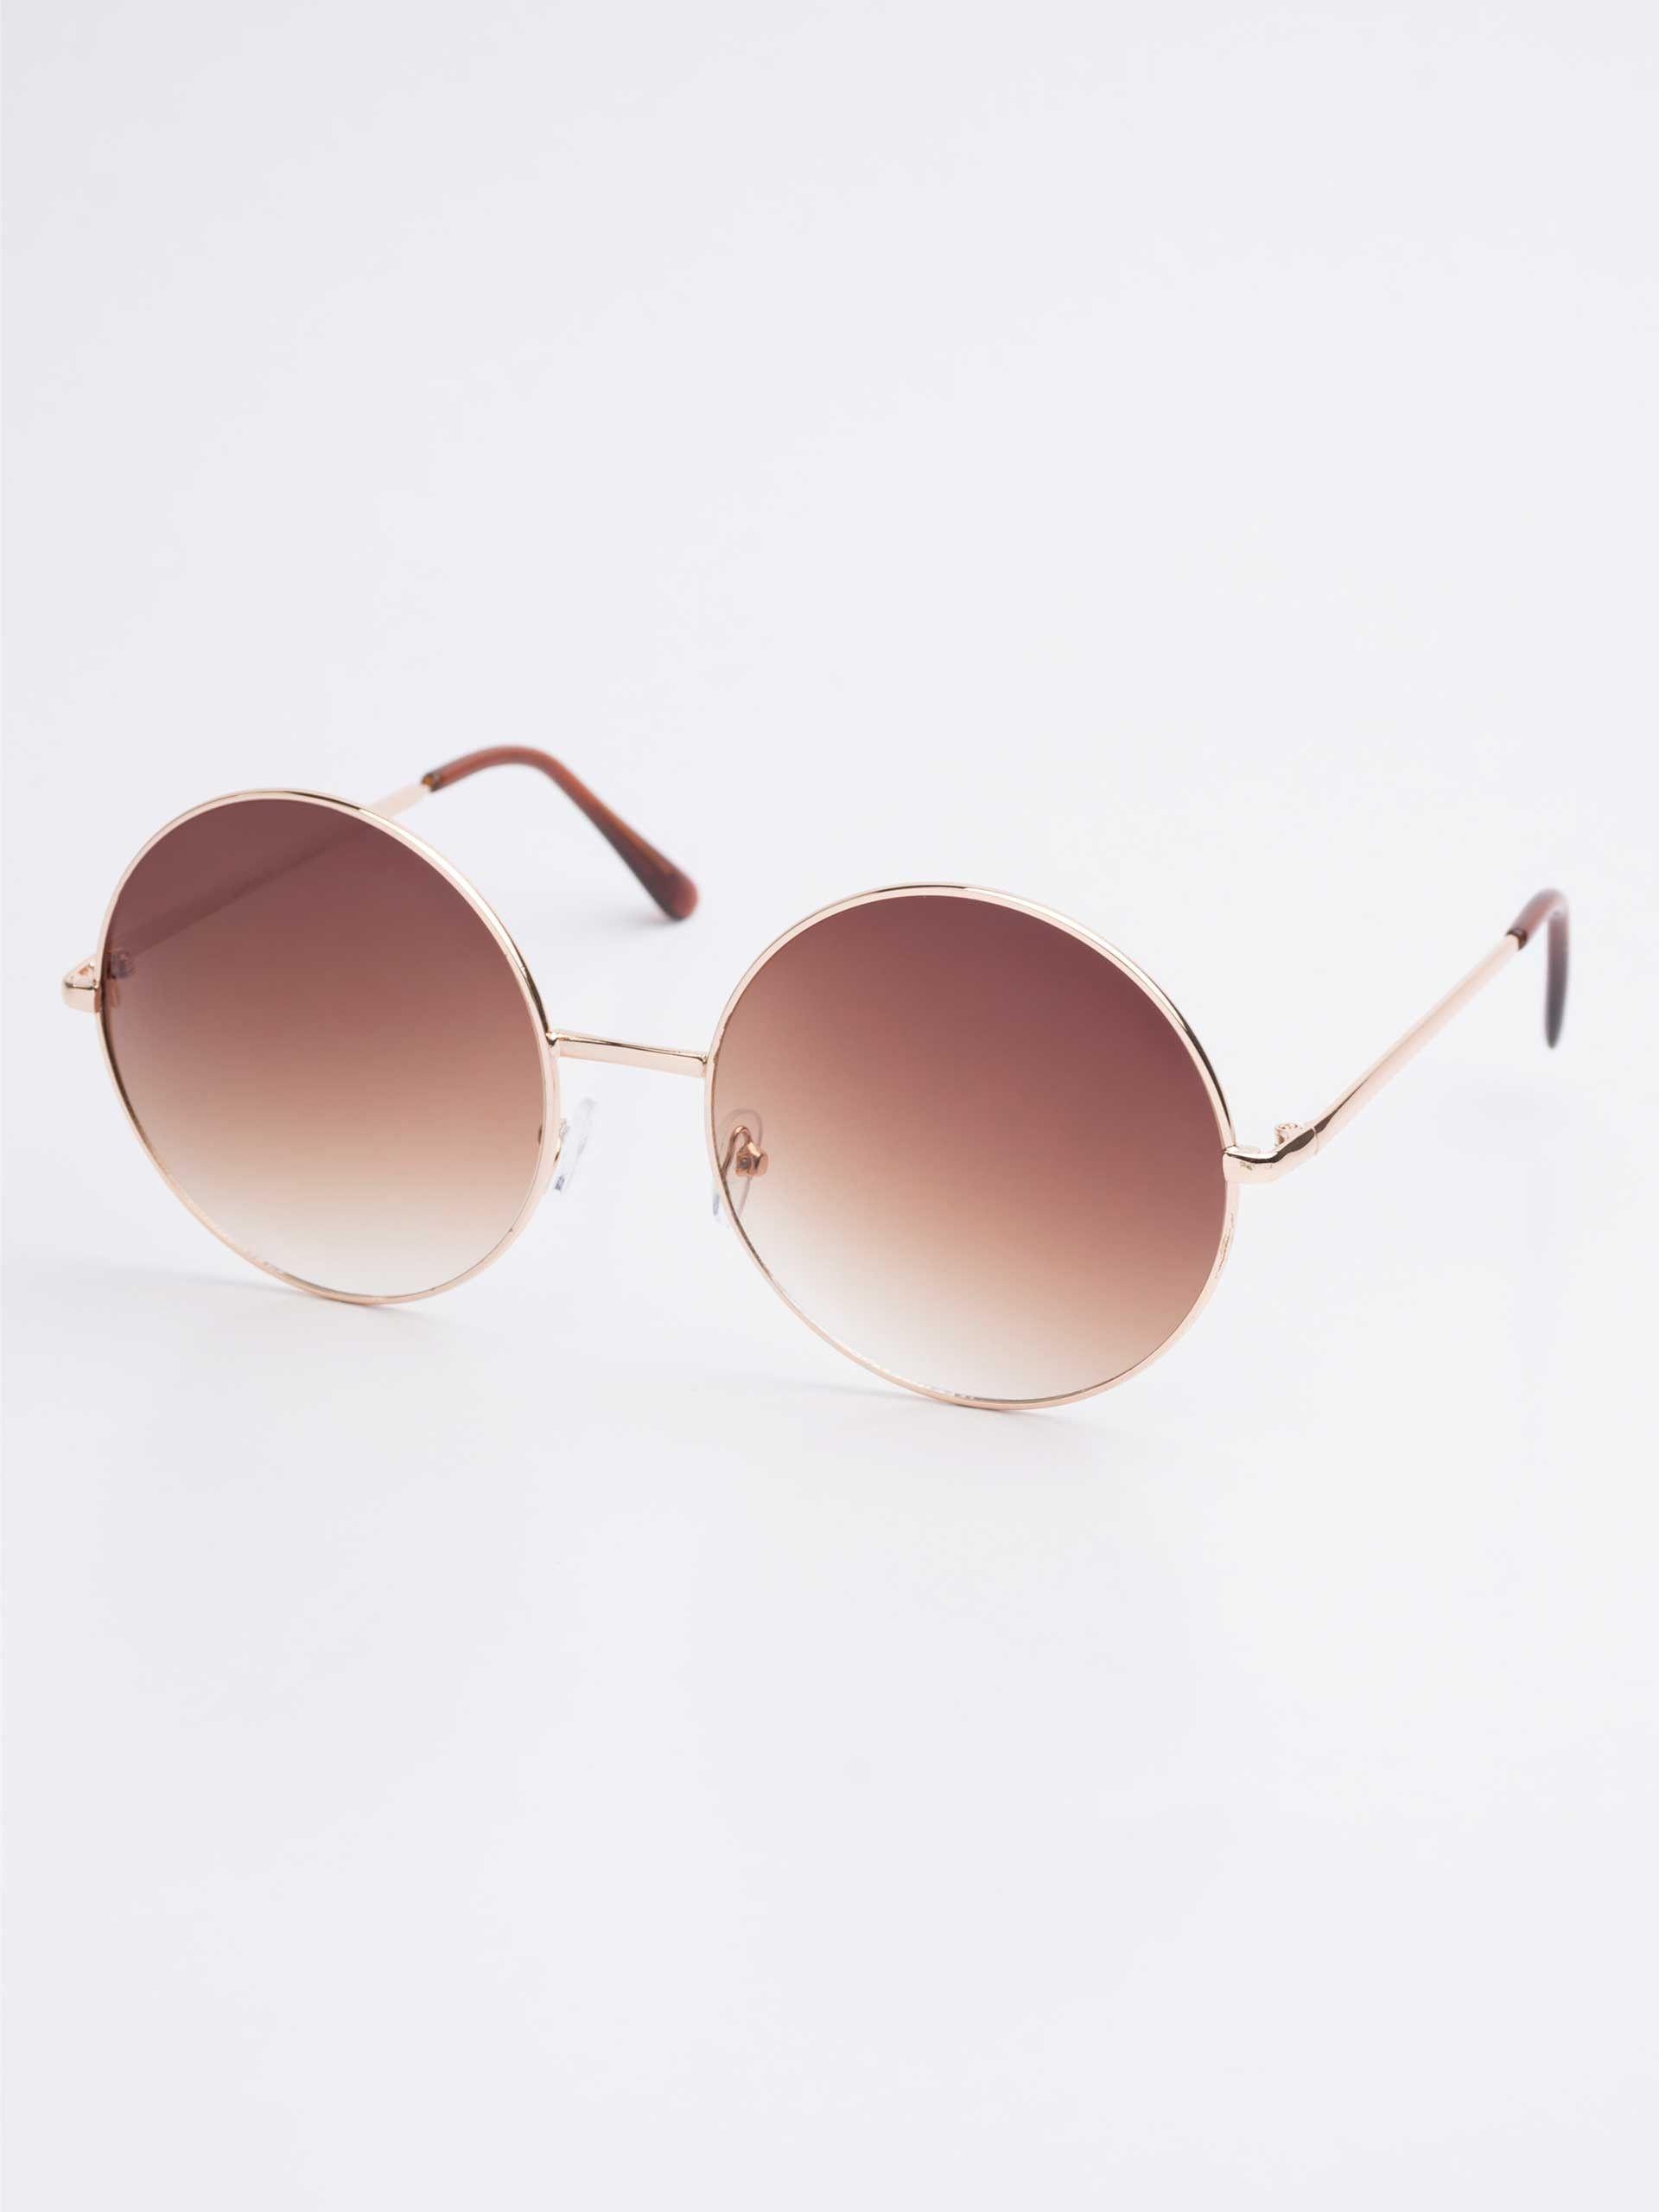 ab55e6746 Óculos de Sol Redondo Descolado Modelo Janis | Lentes de sol ...